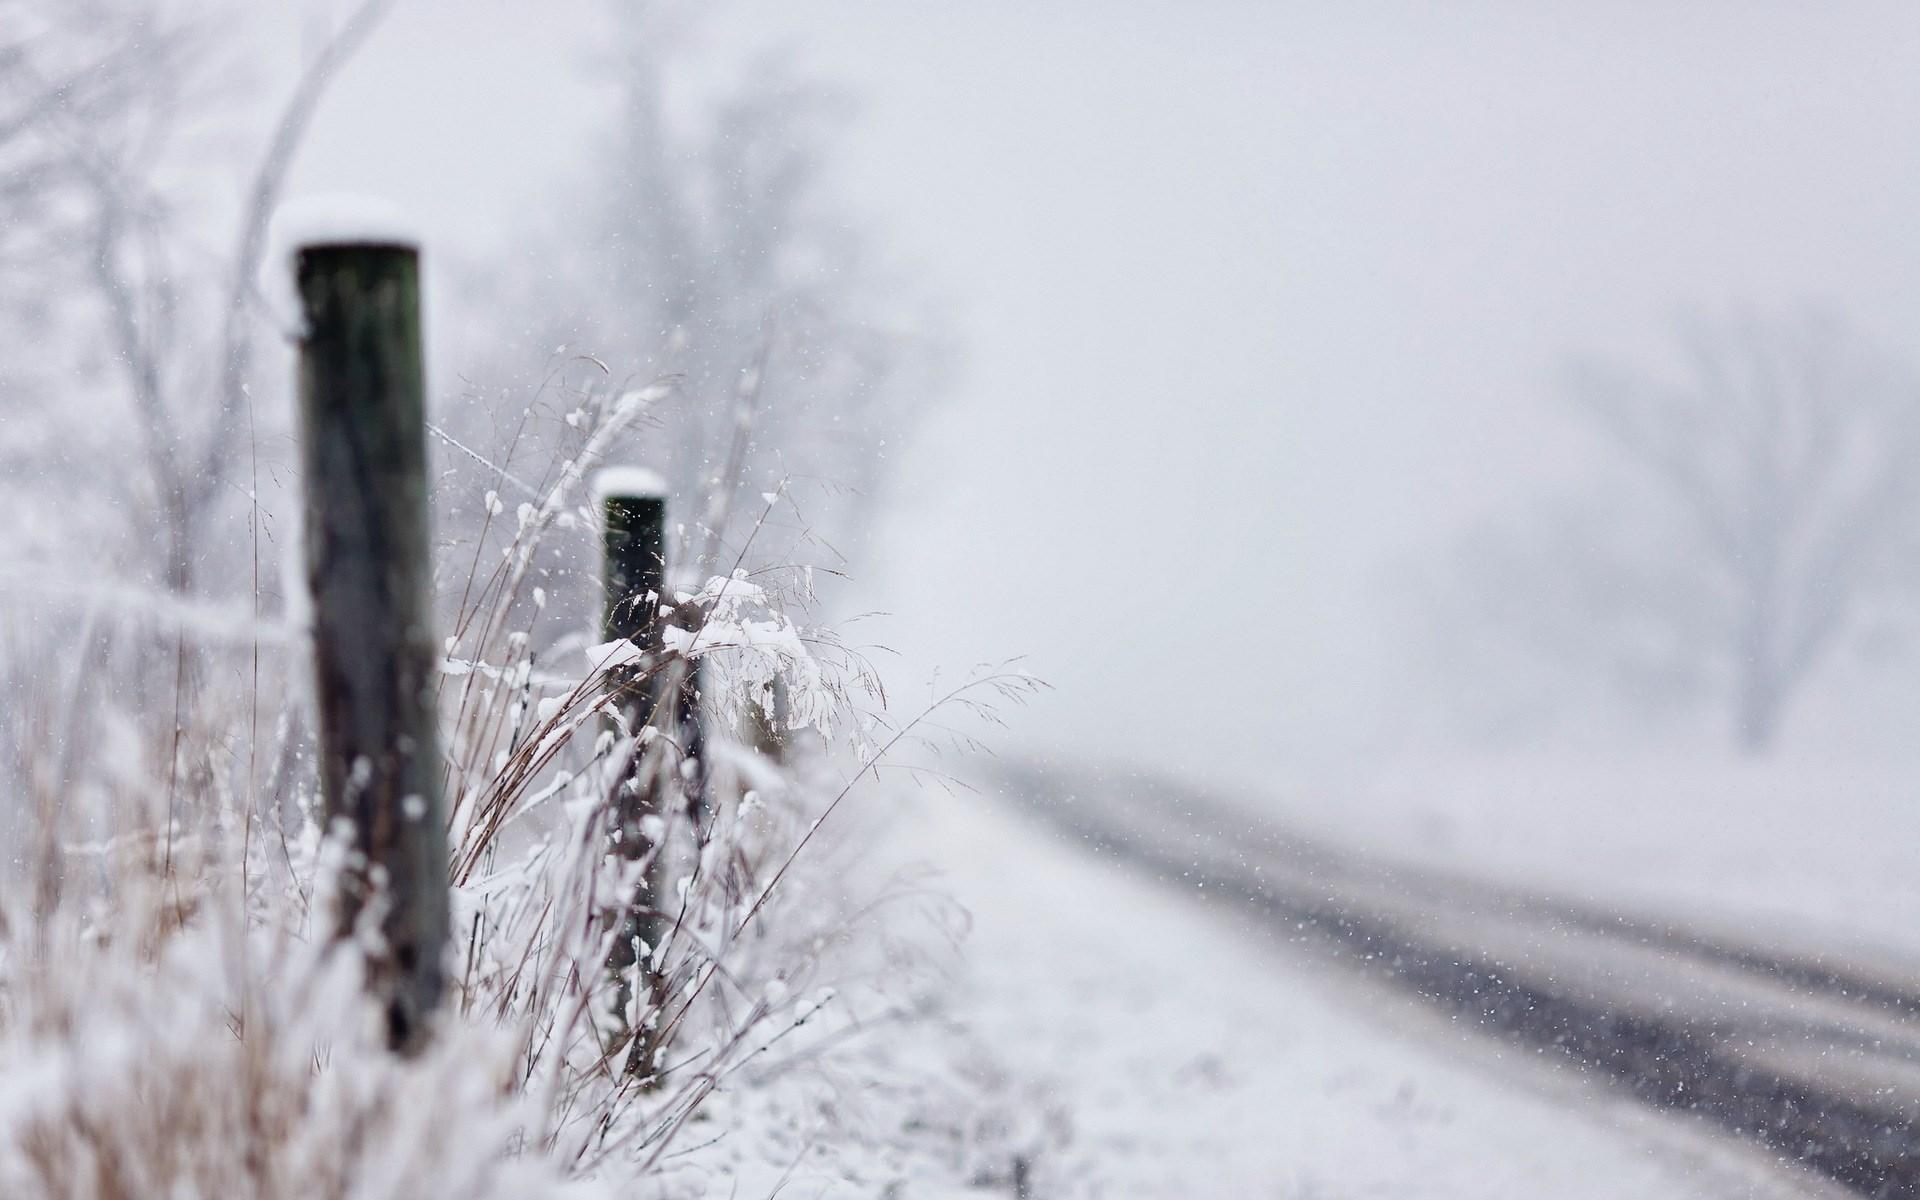 Road Winter Snowfall Nature